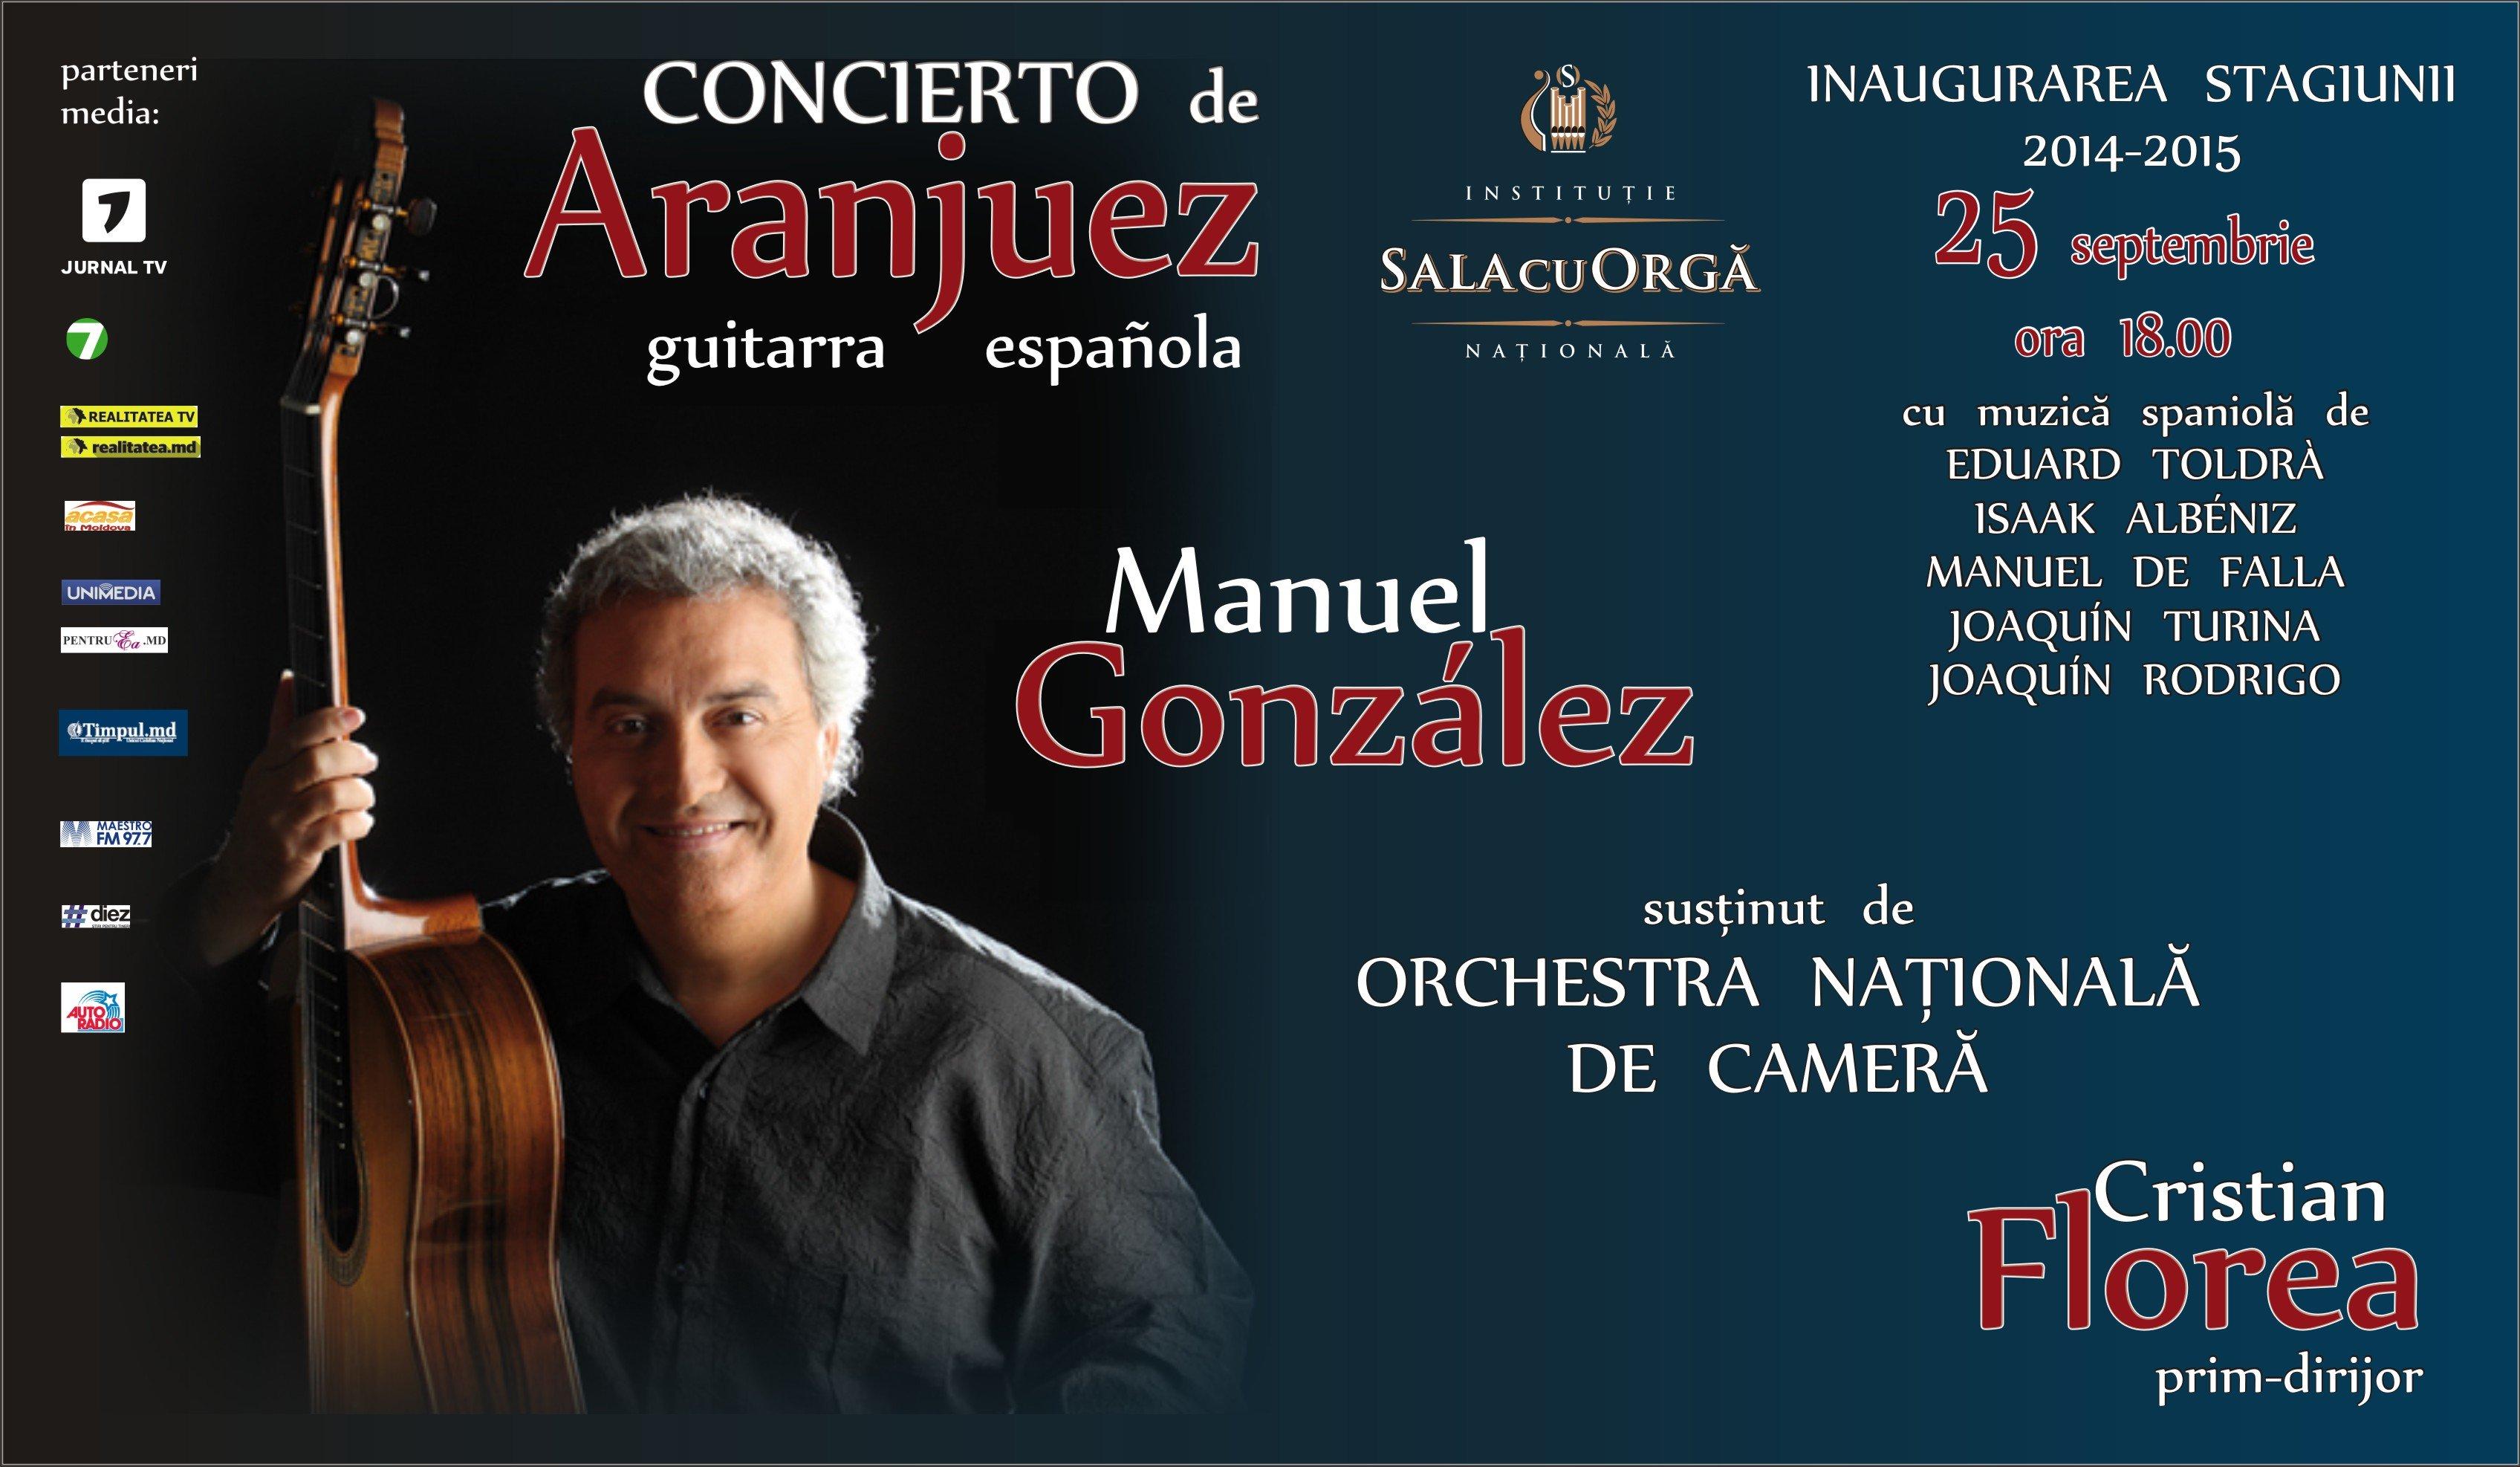 Manuel Gonzales - Inaugurarea Stagiunii 2014 - 2015